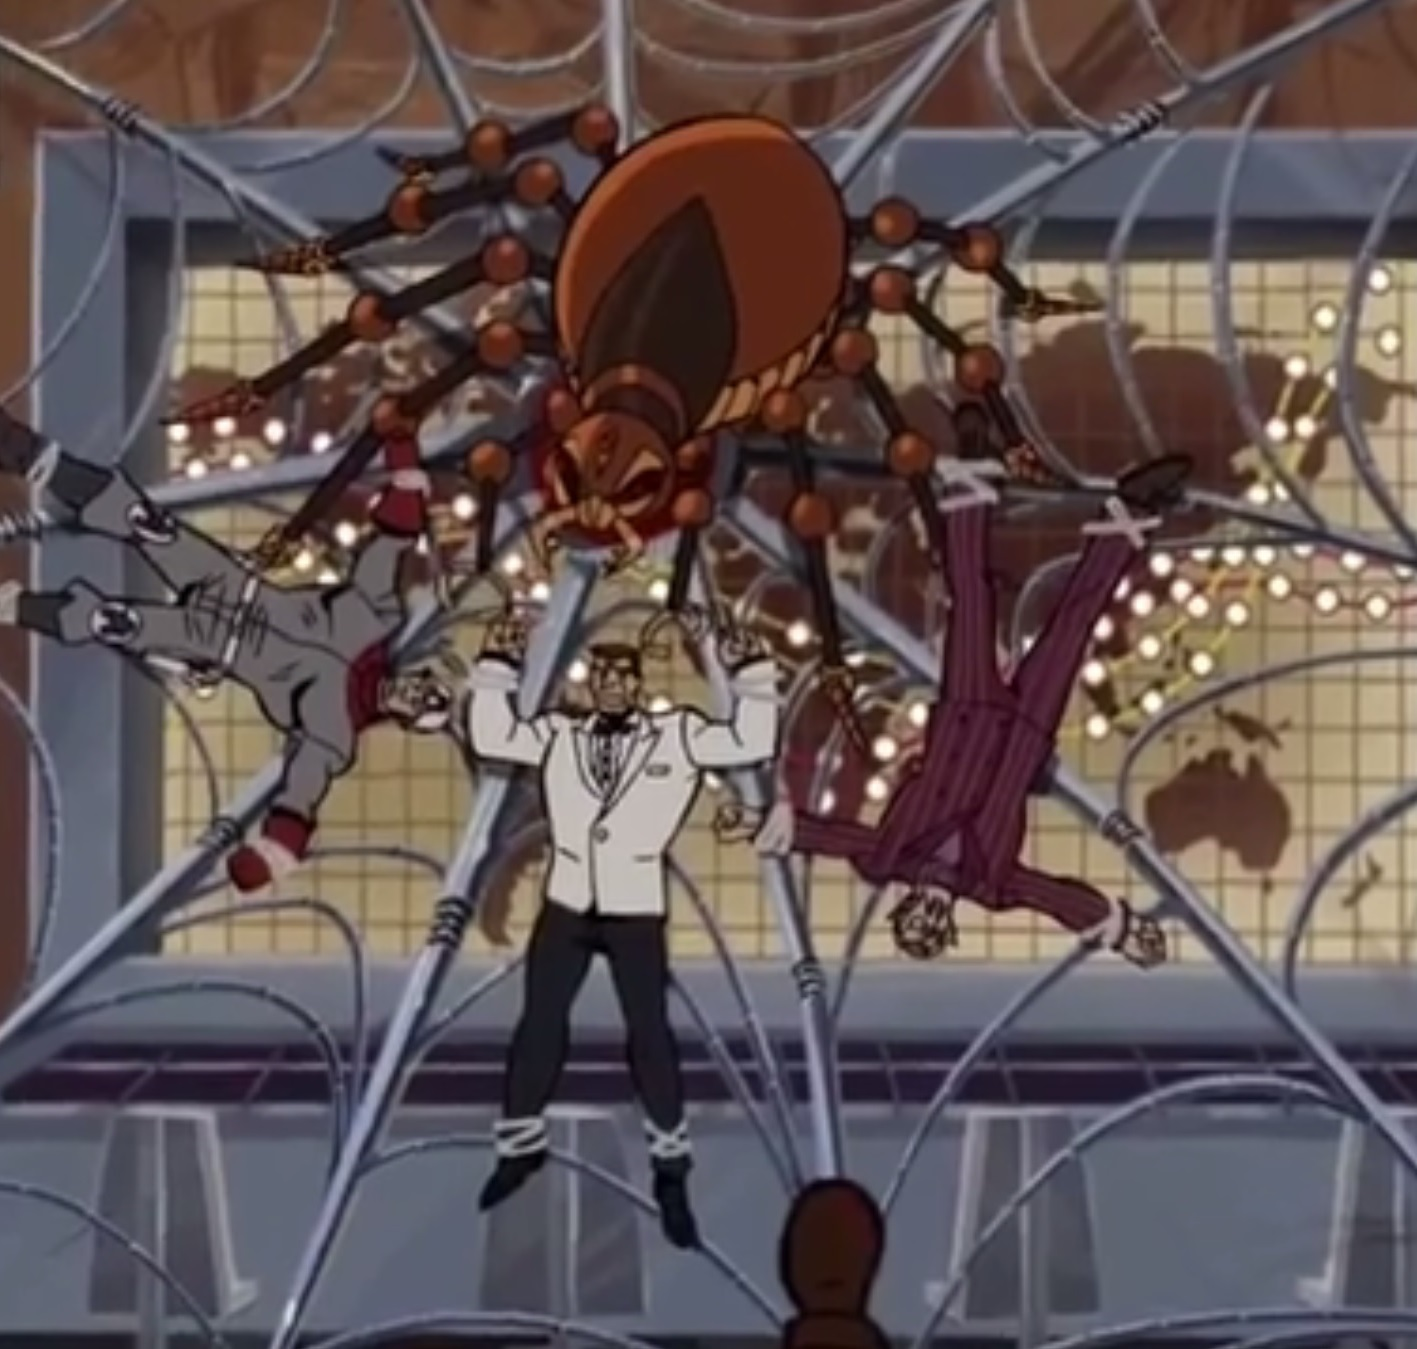 Italian Spiderbot